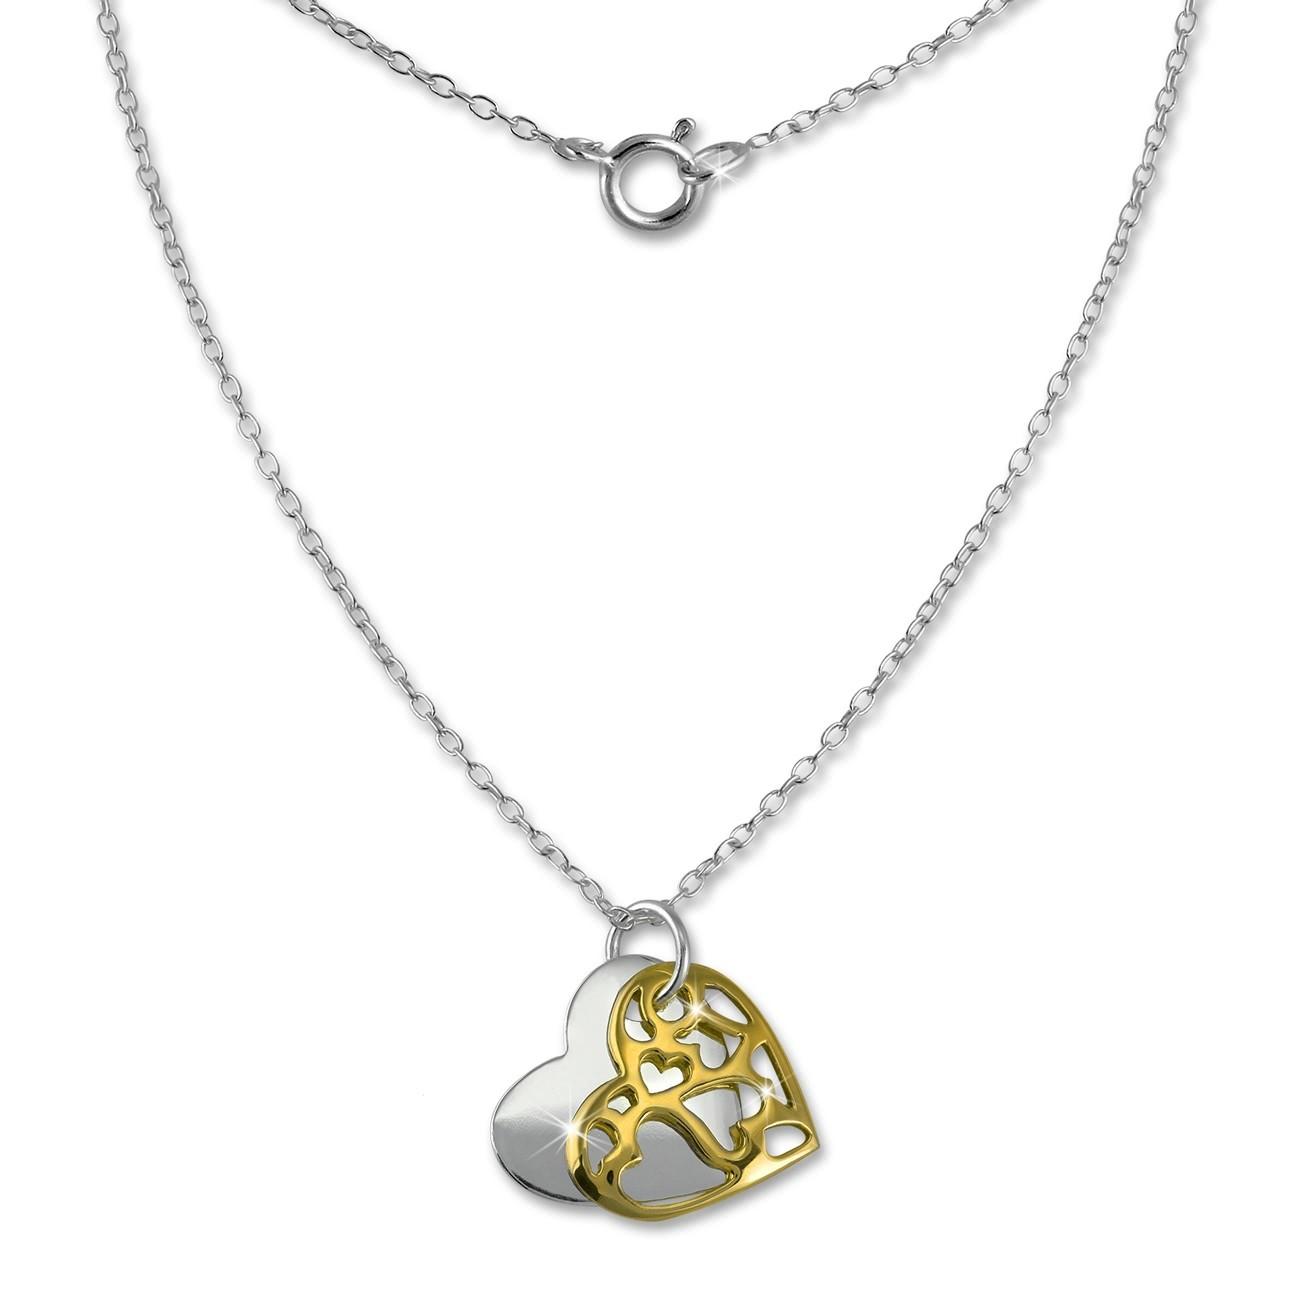 SilberDream Kette Doppel Herz vergoldet 925 Sterling Silber 45cm SDK8007Y